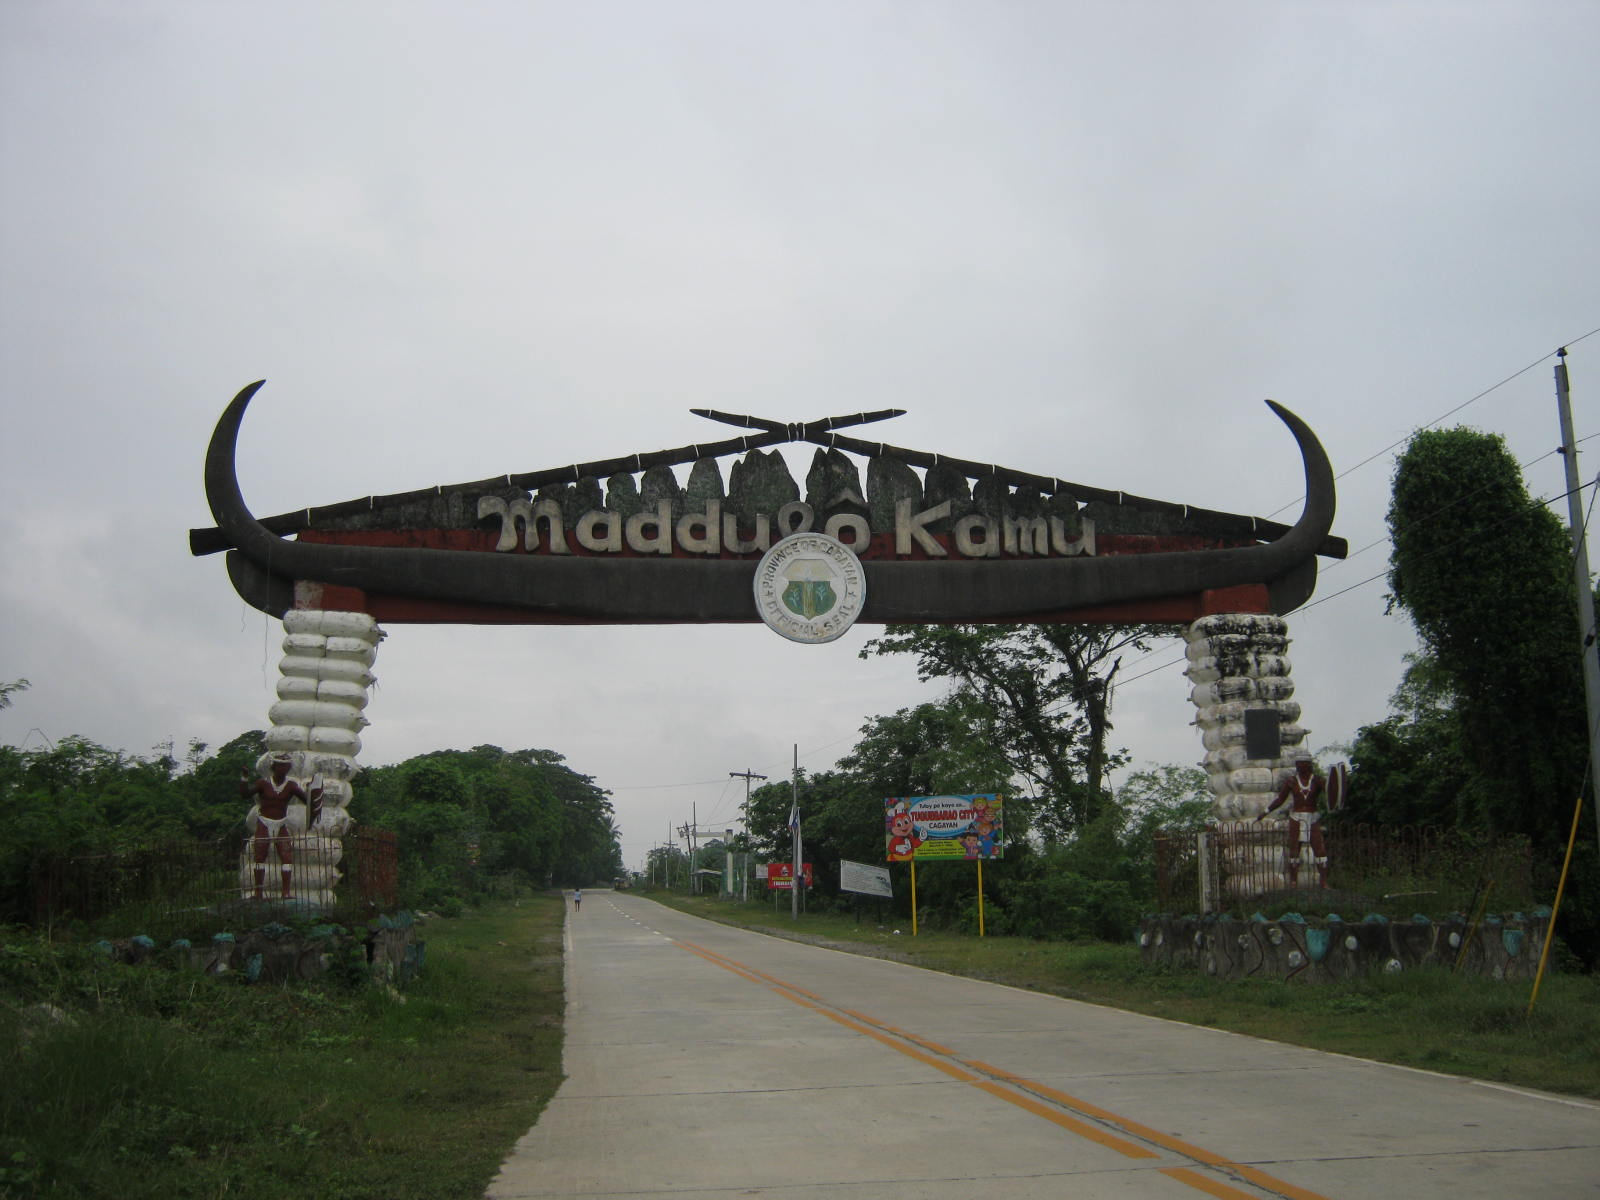 Tuguegarao City Philippines  city photos gallery : TuguegaraoCity.Net Philippines